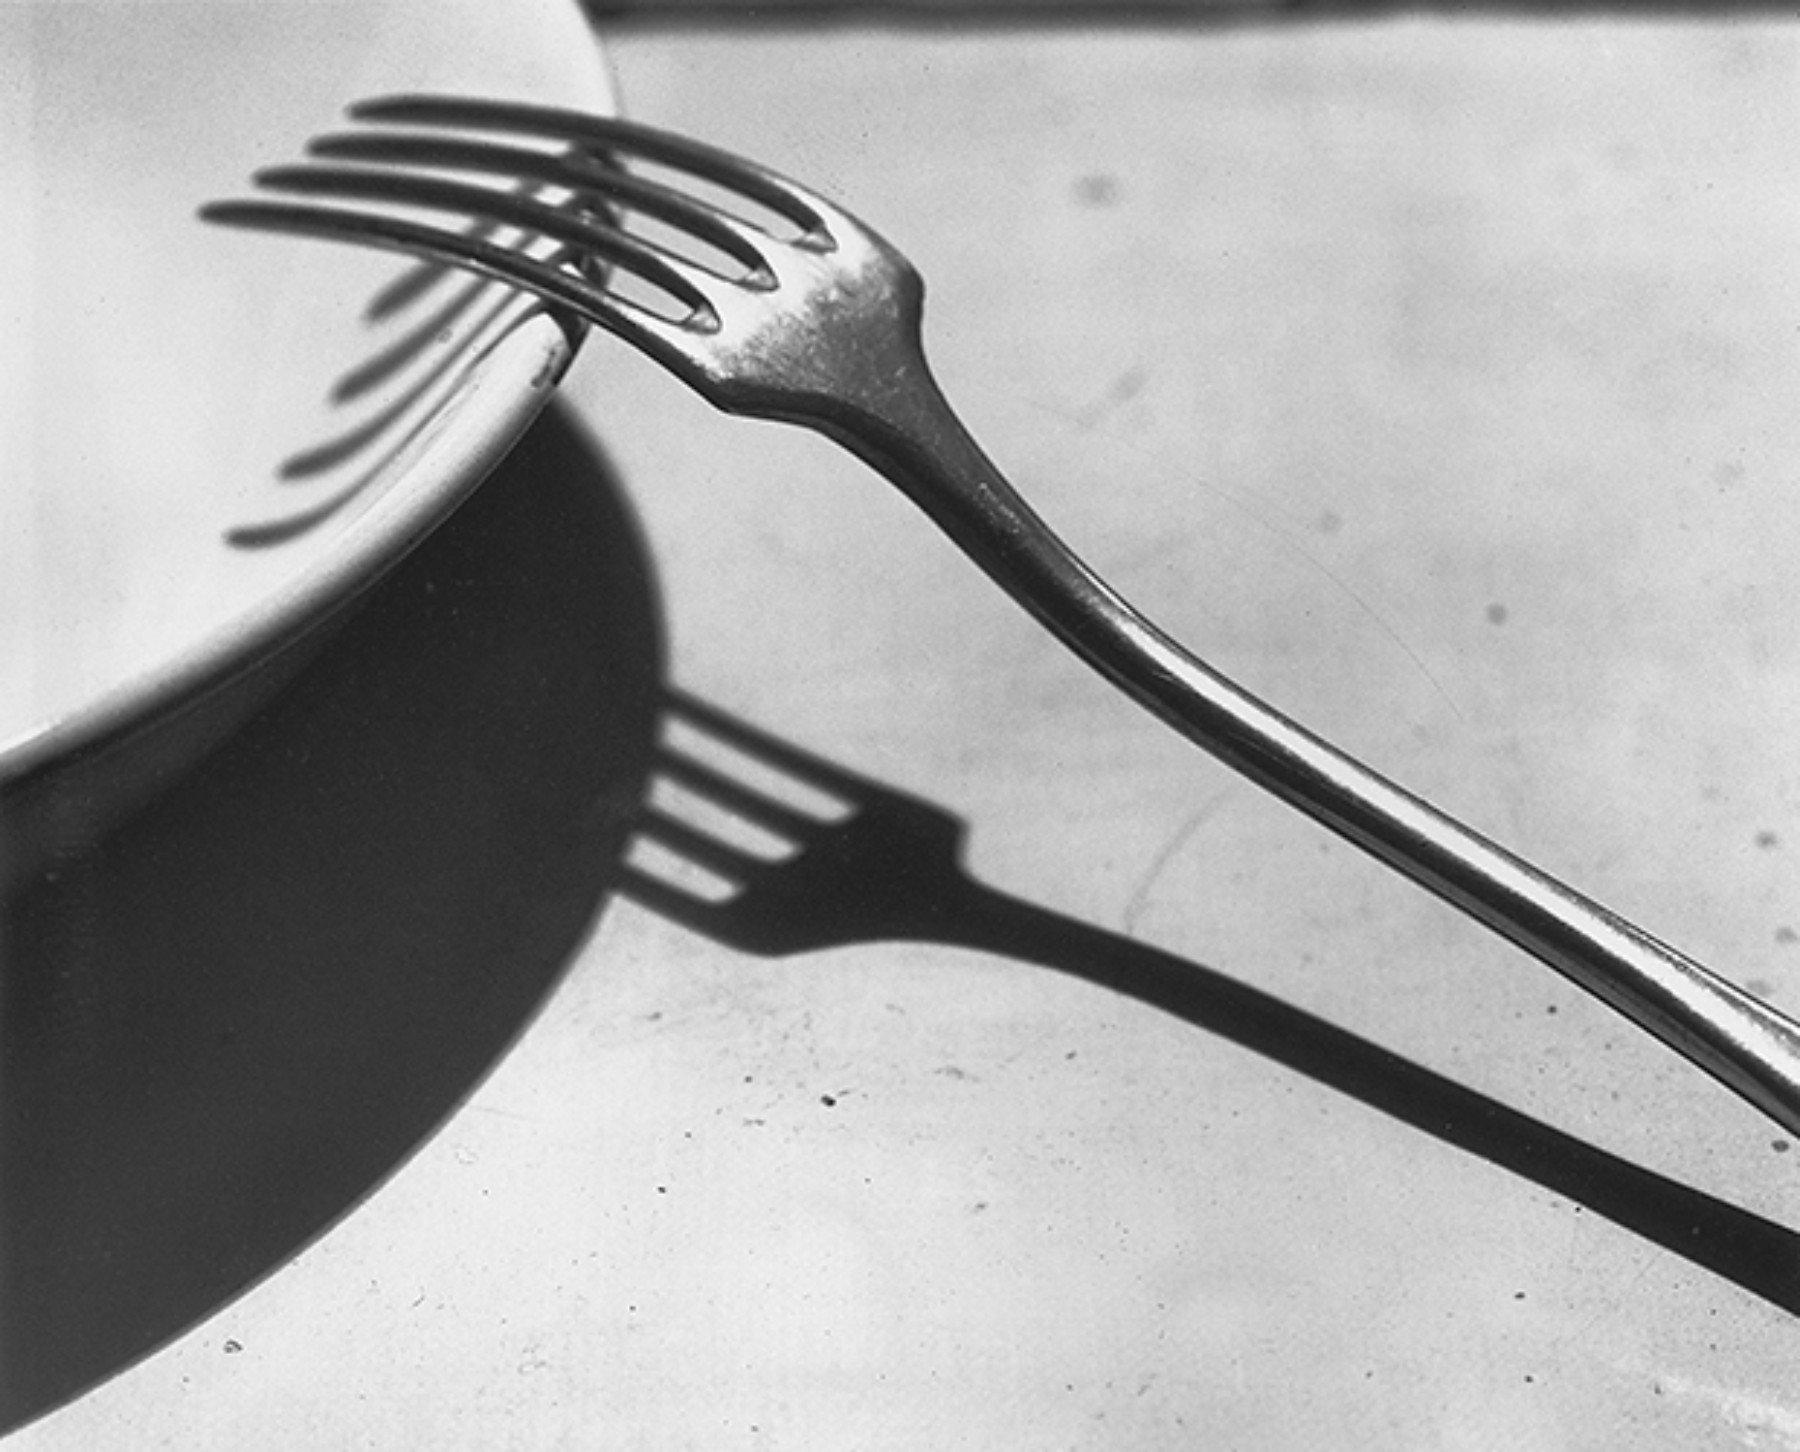 La fourche, 1928 © Andre Kertesz